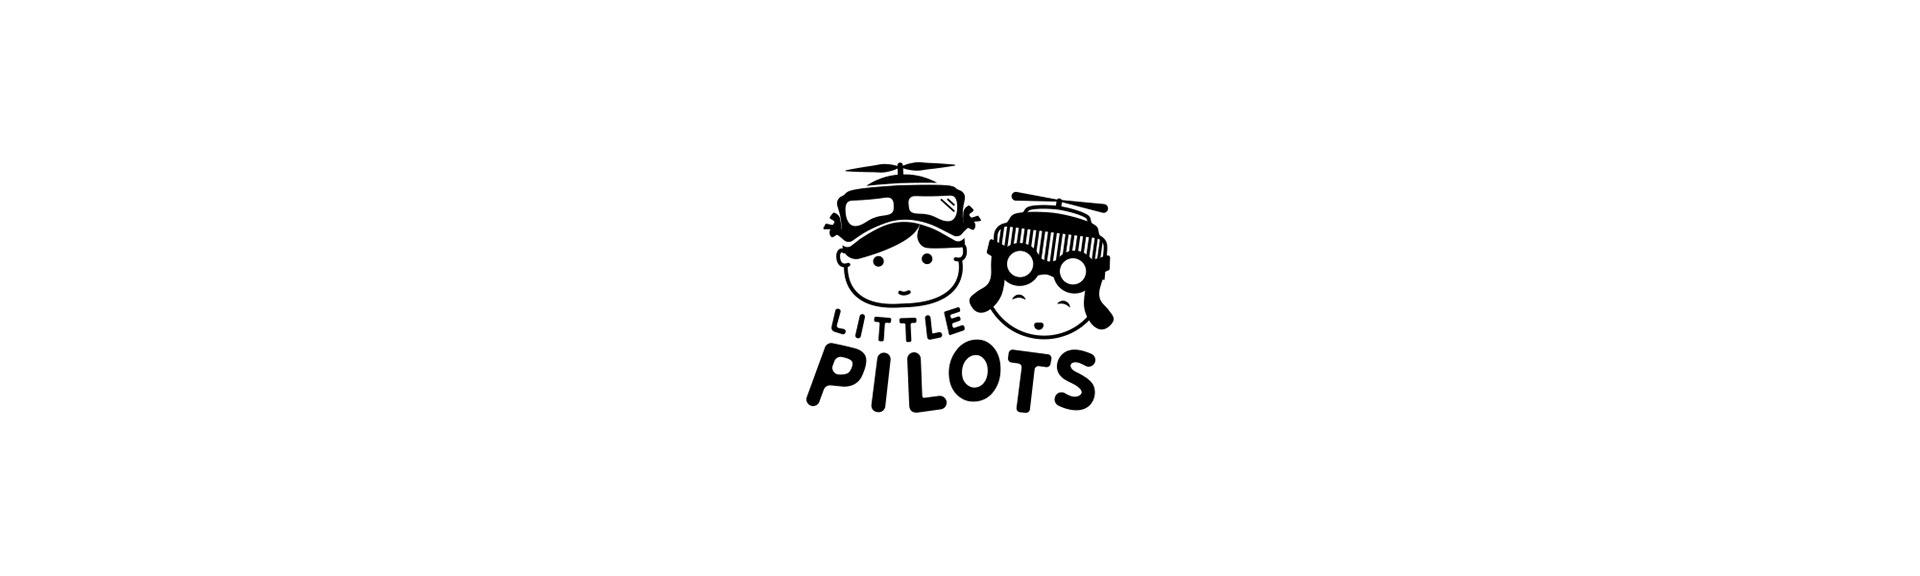 little pilots logo black and white